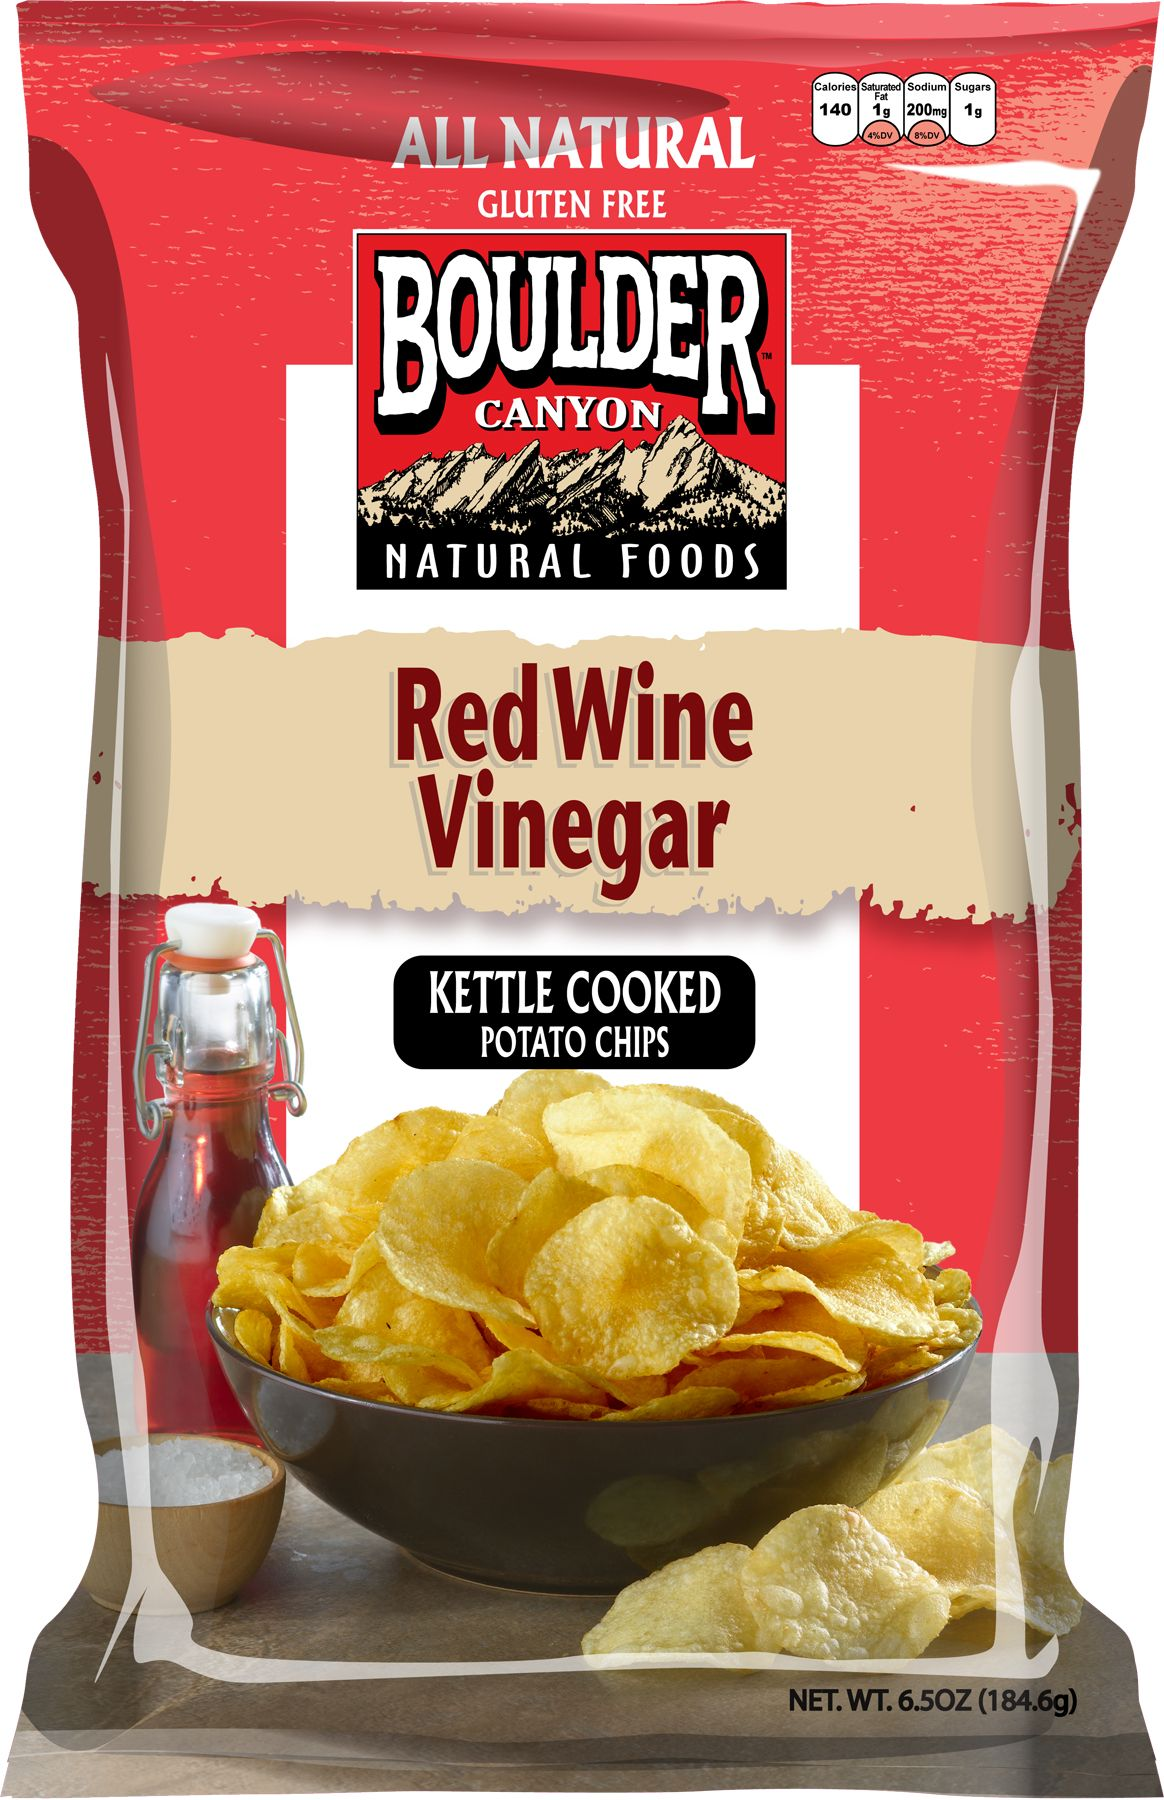 Boulder canyon natural foods donates food samples or gift